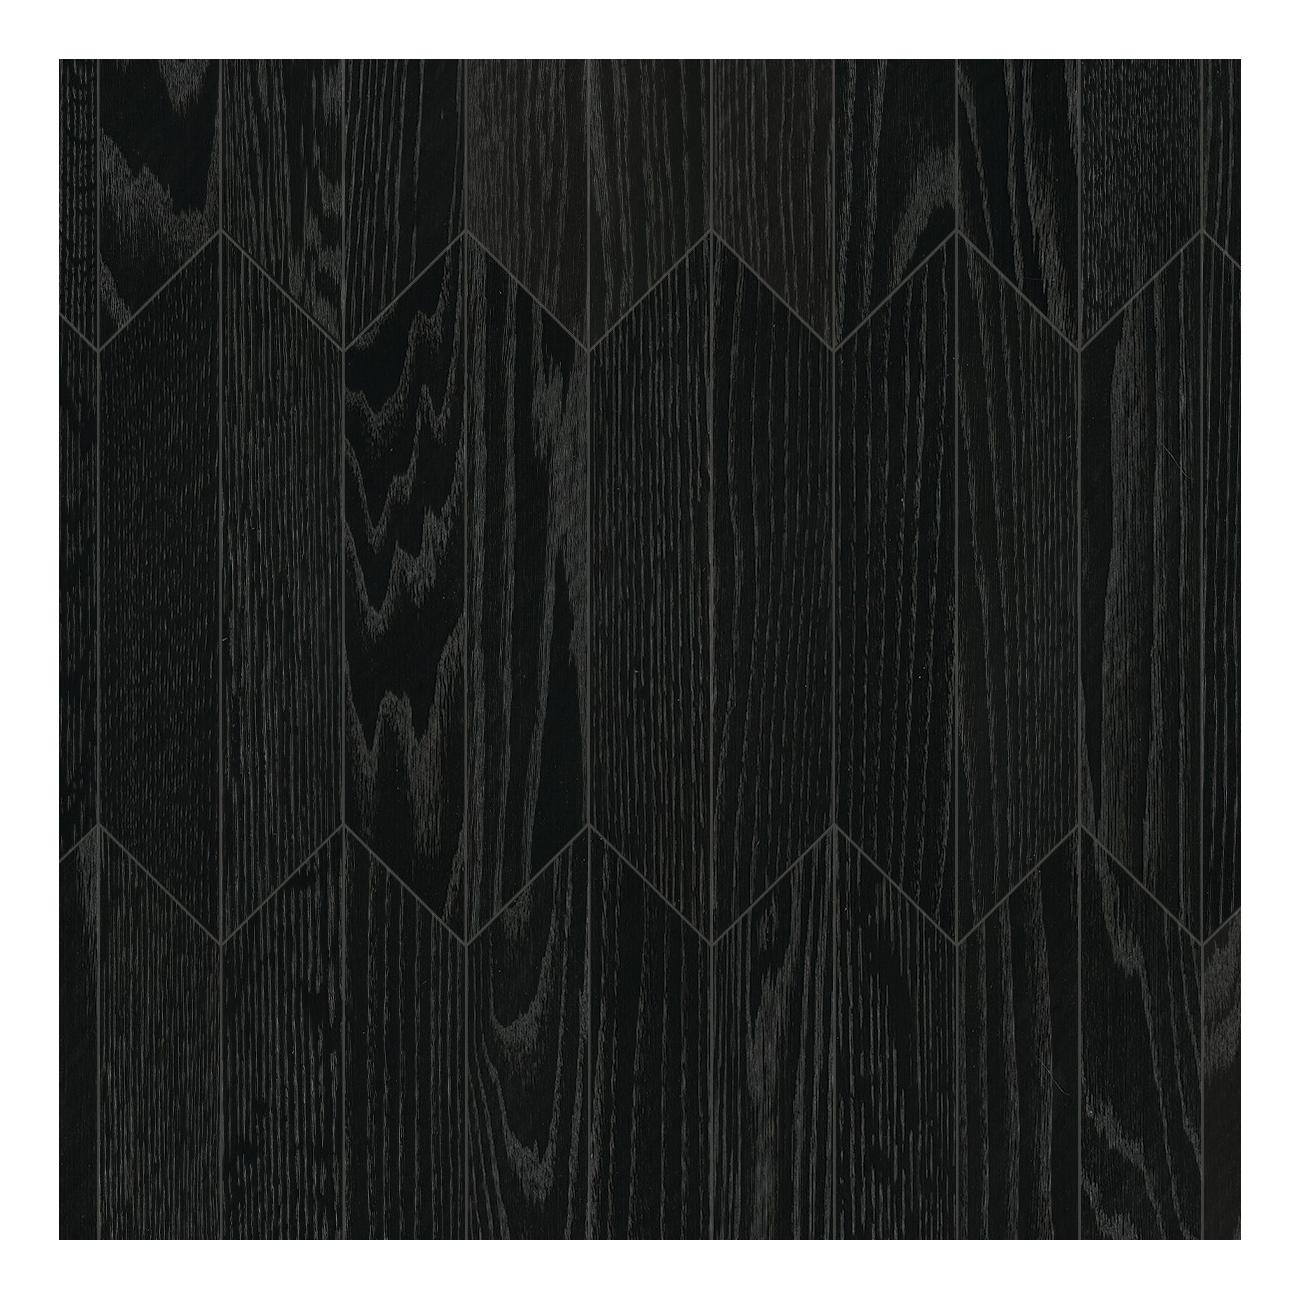 Bisazza Wood Doga Notte (D) 101X606